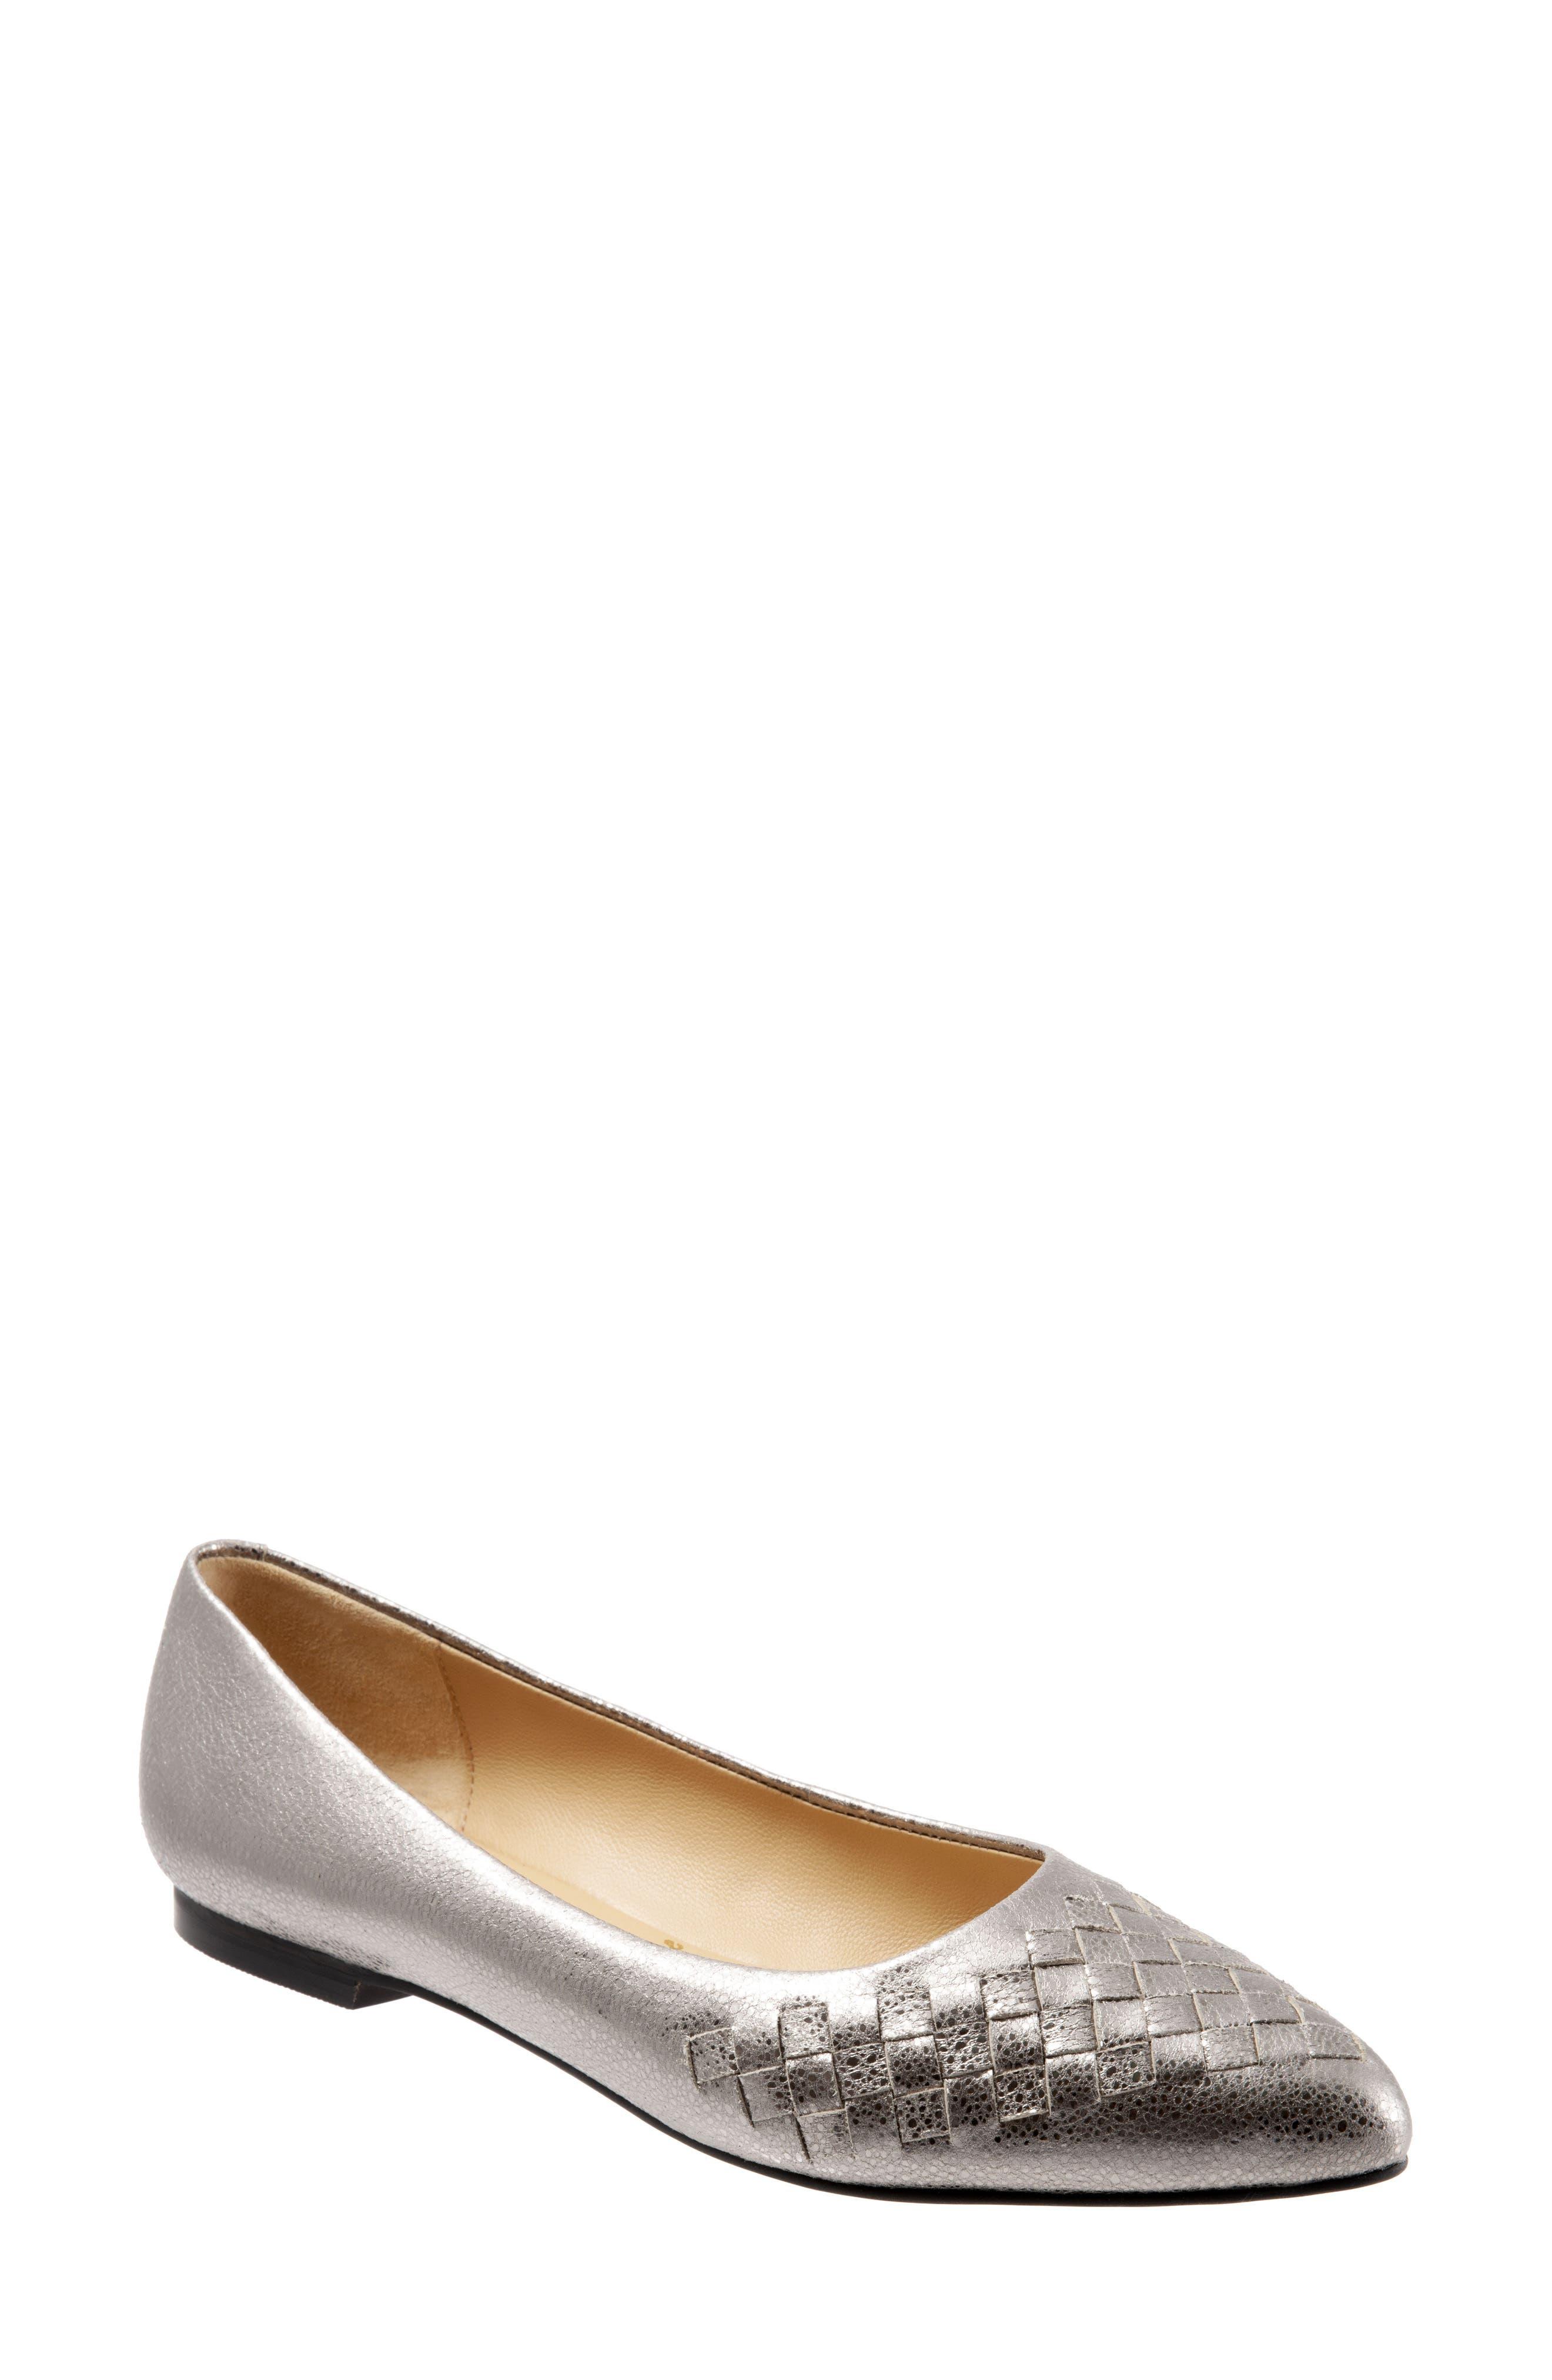 Trotters Estee Pointed Toe Flat- Metallic